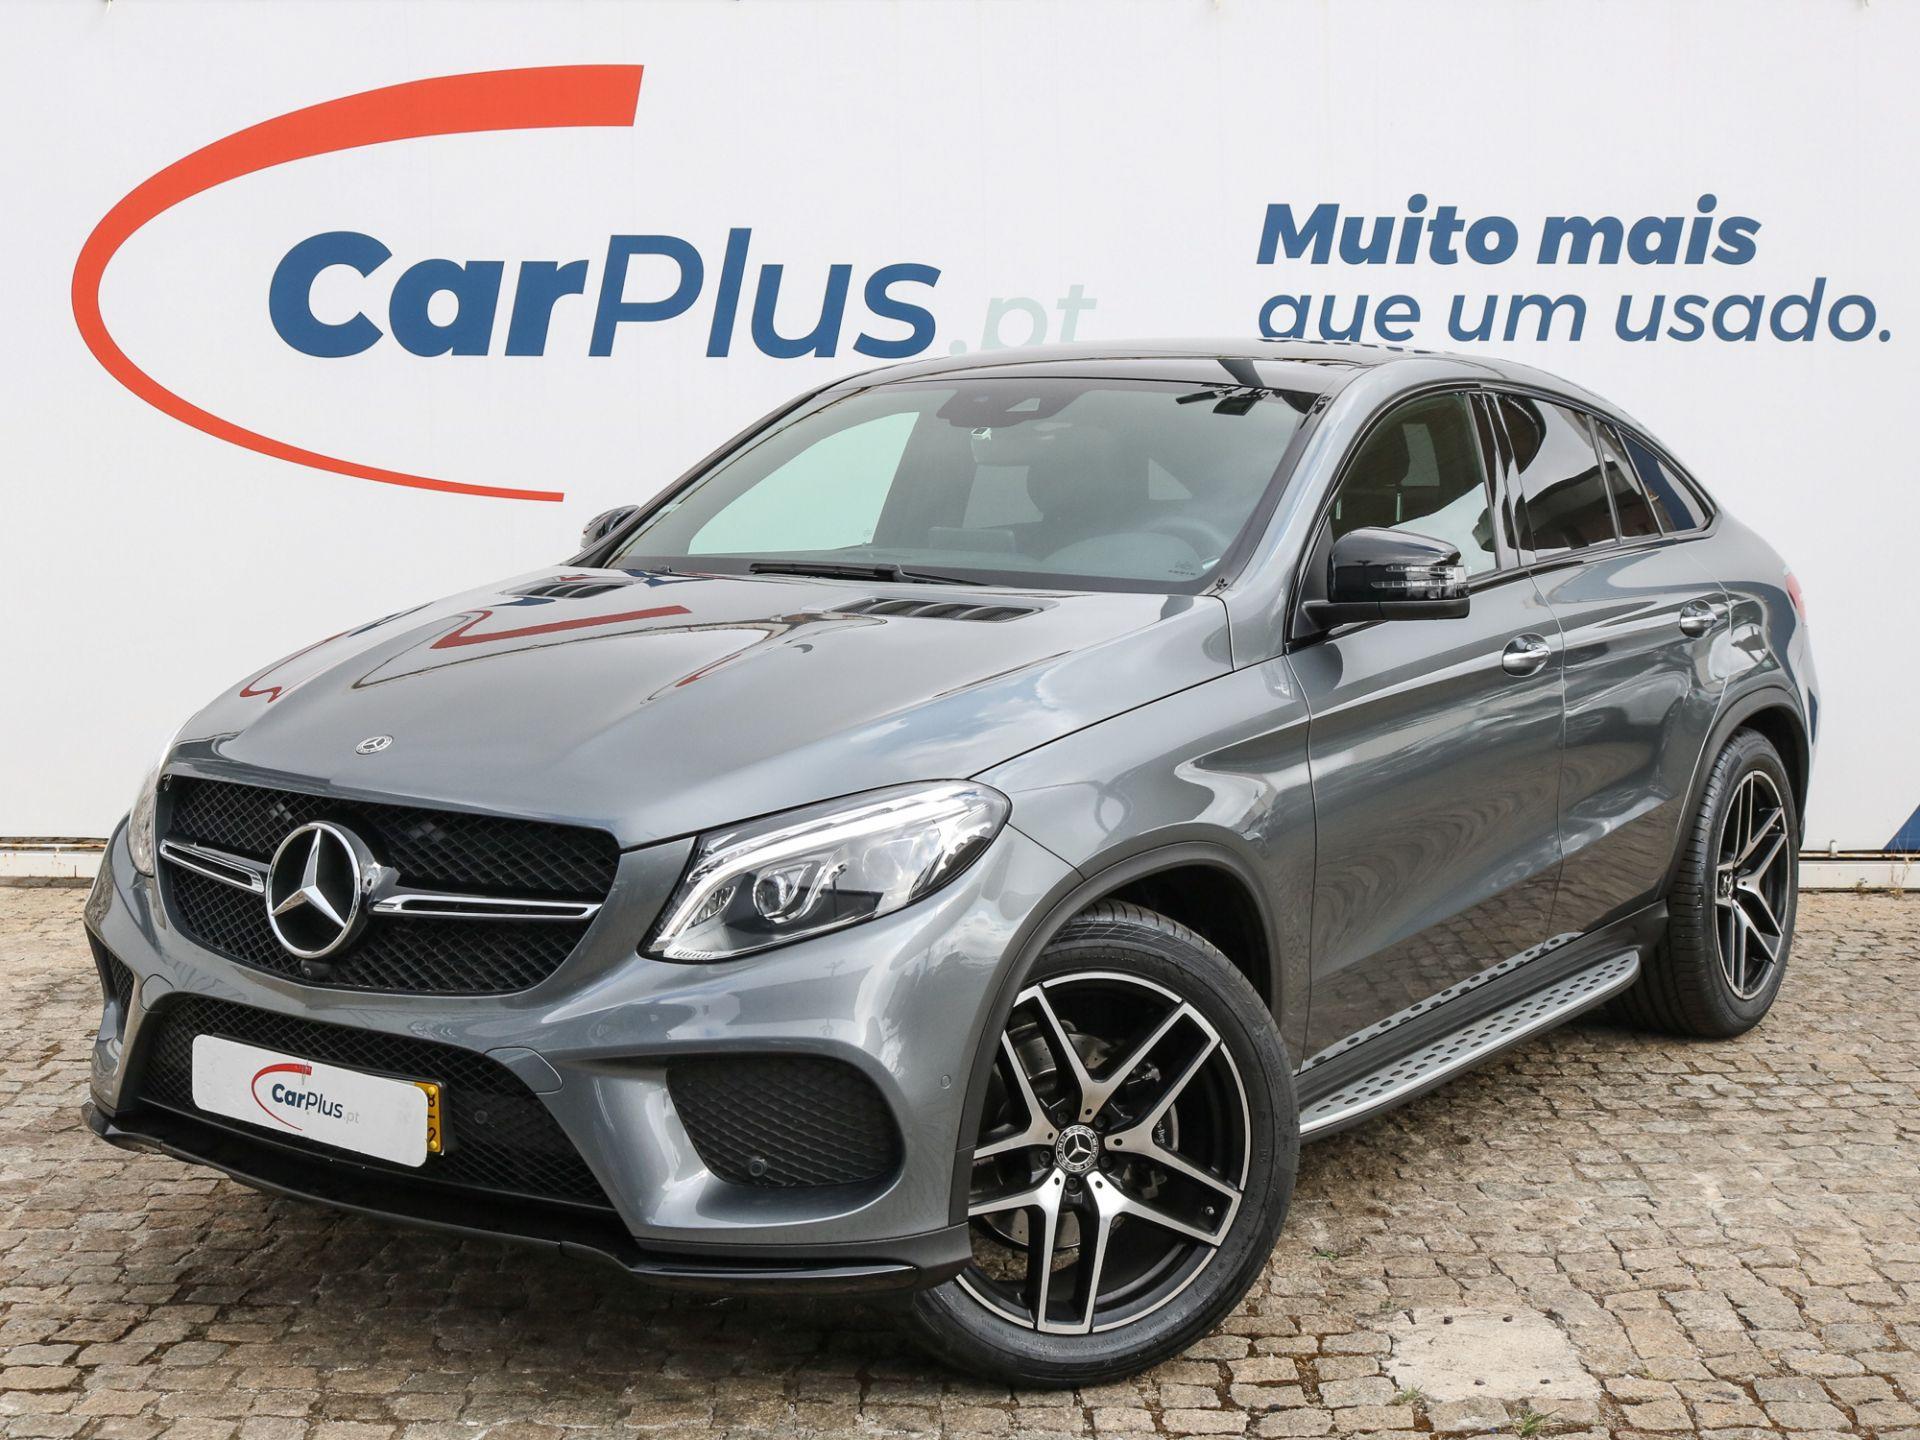 Mercedes Benz Classe GLE Coupe 3.0 350 d 4MATICoupe segunda mão Porto